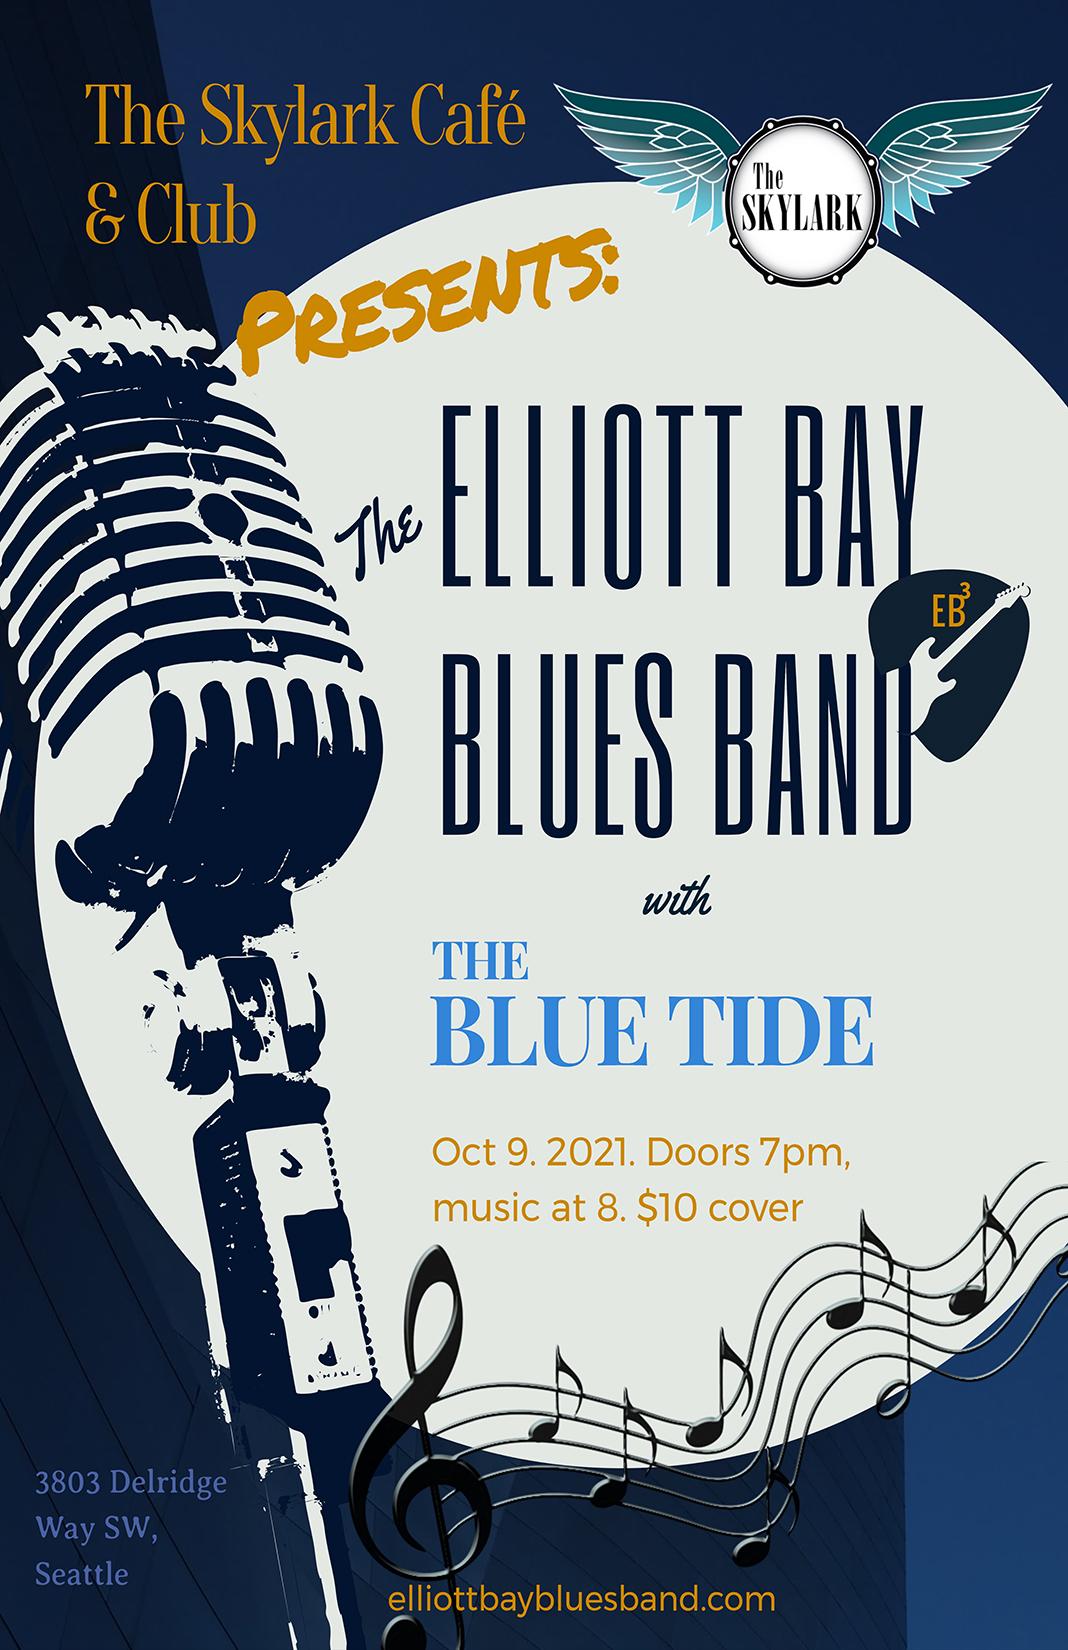 Elliott Bay Blues Band featuring The Blue Tide